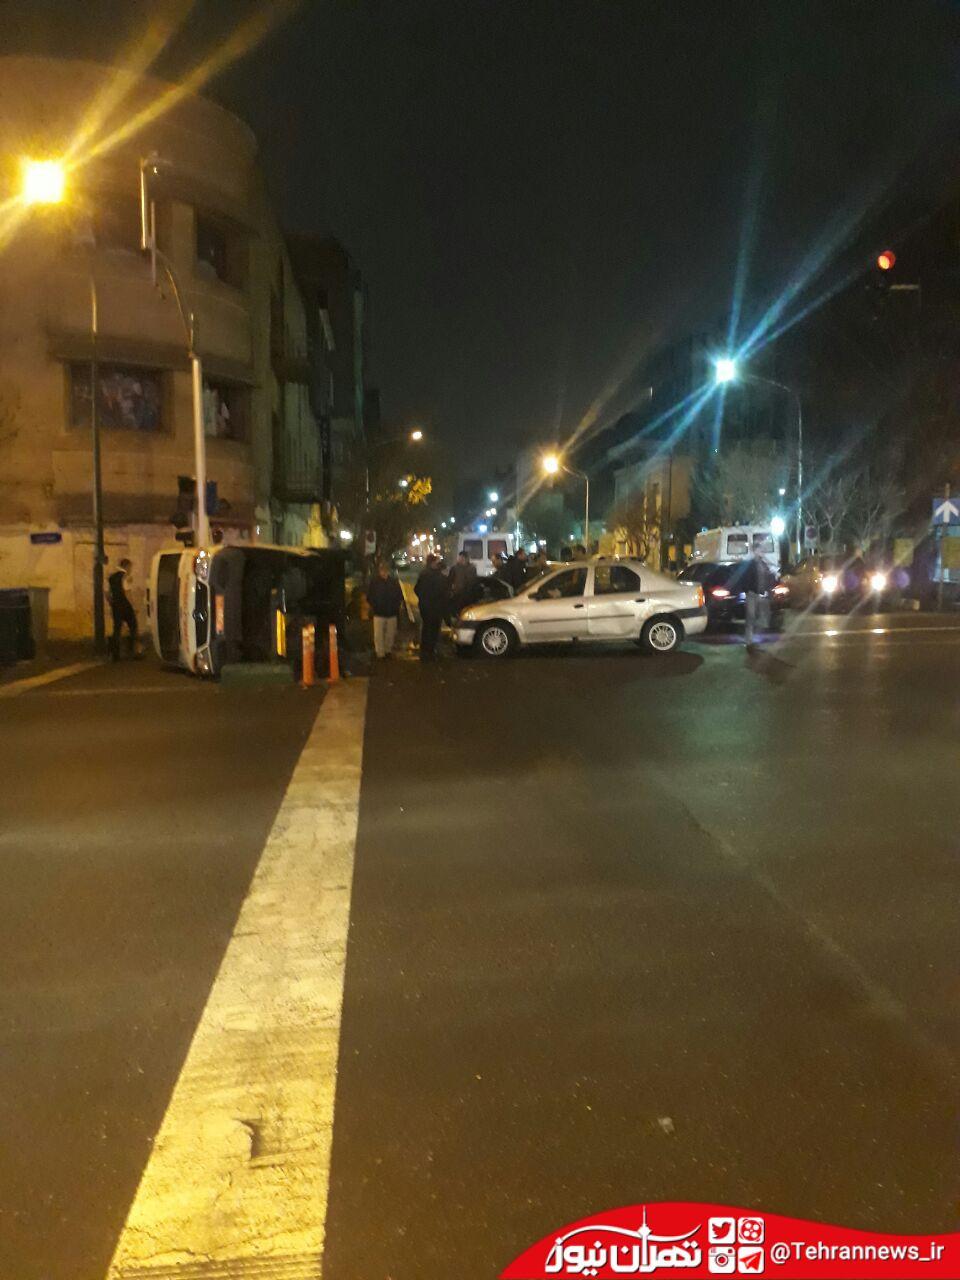 آمبولانس اورژانس در خیابان قرنی چپ شد + عکس